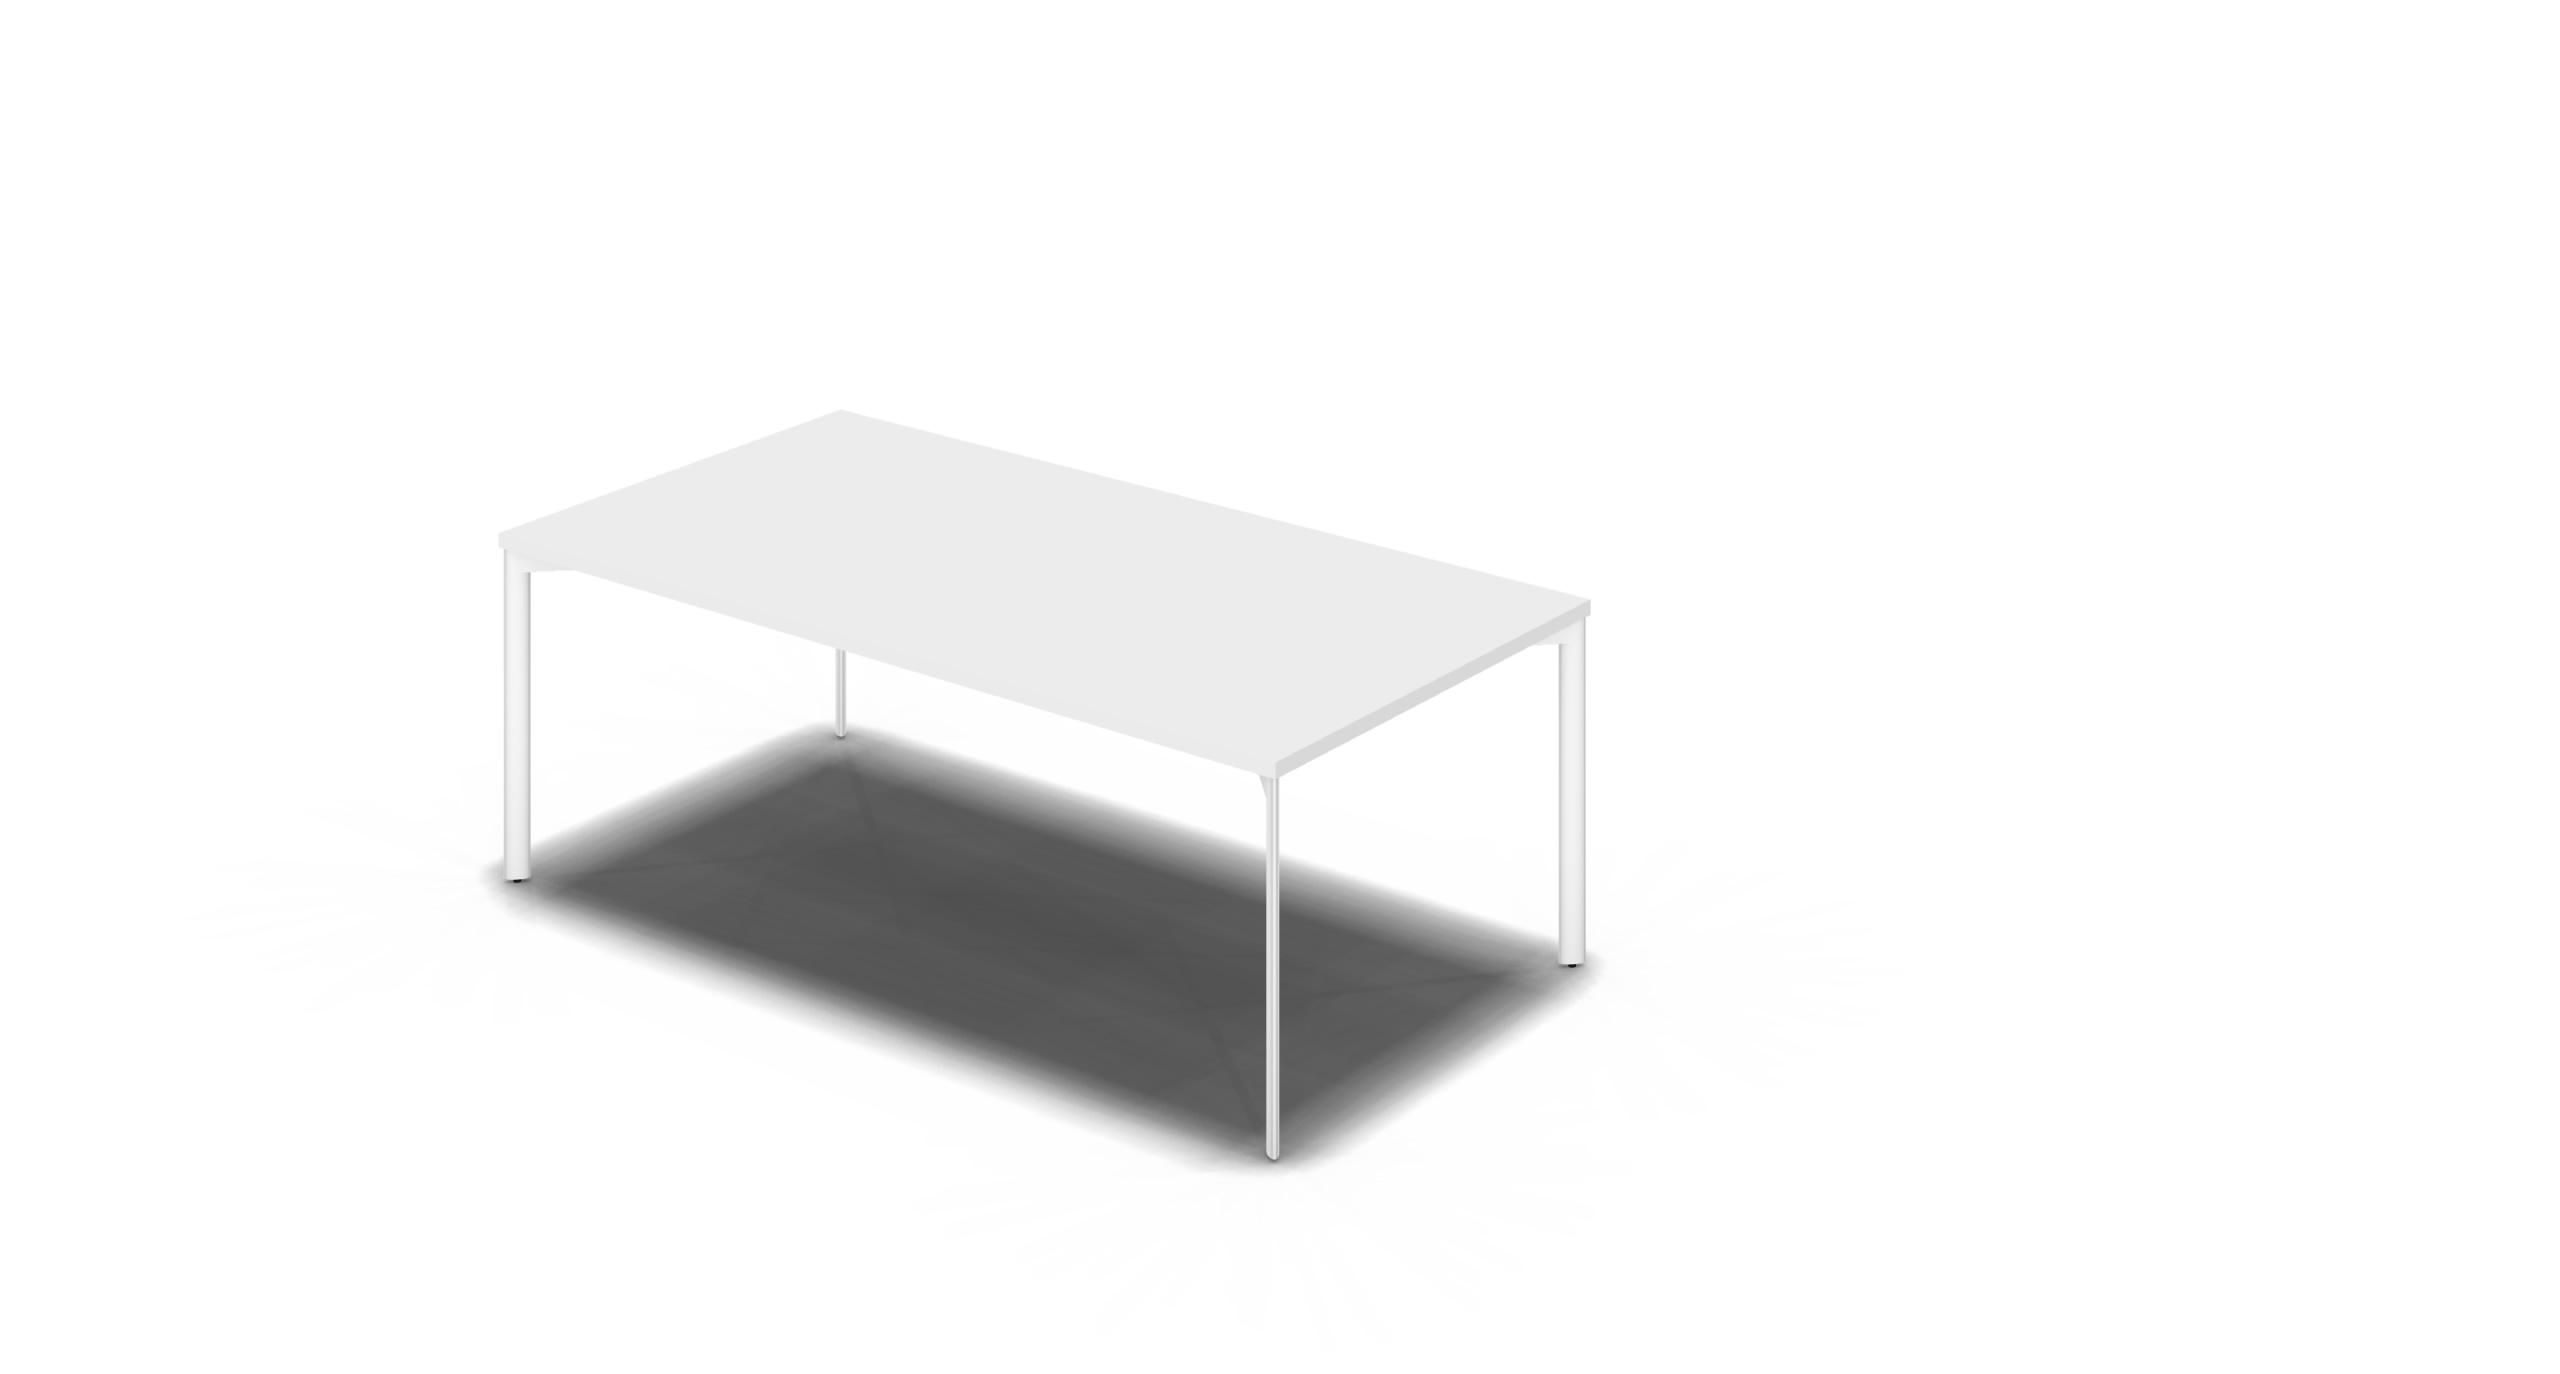 Table_Slim_1800x900_White_White_noOption